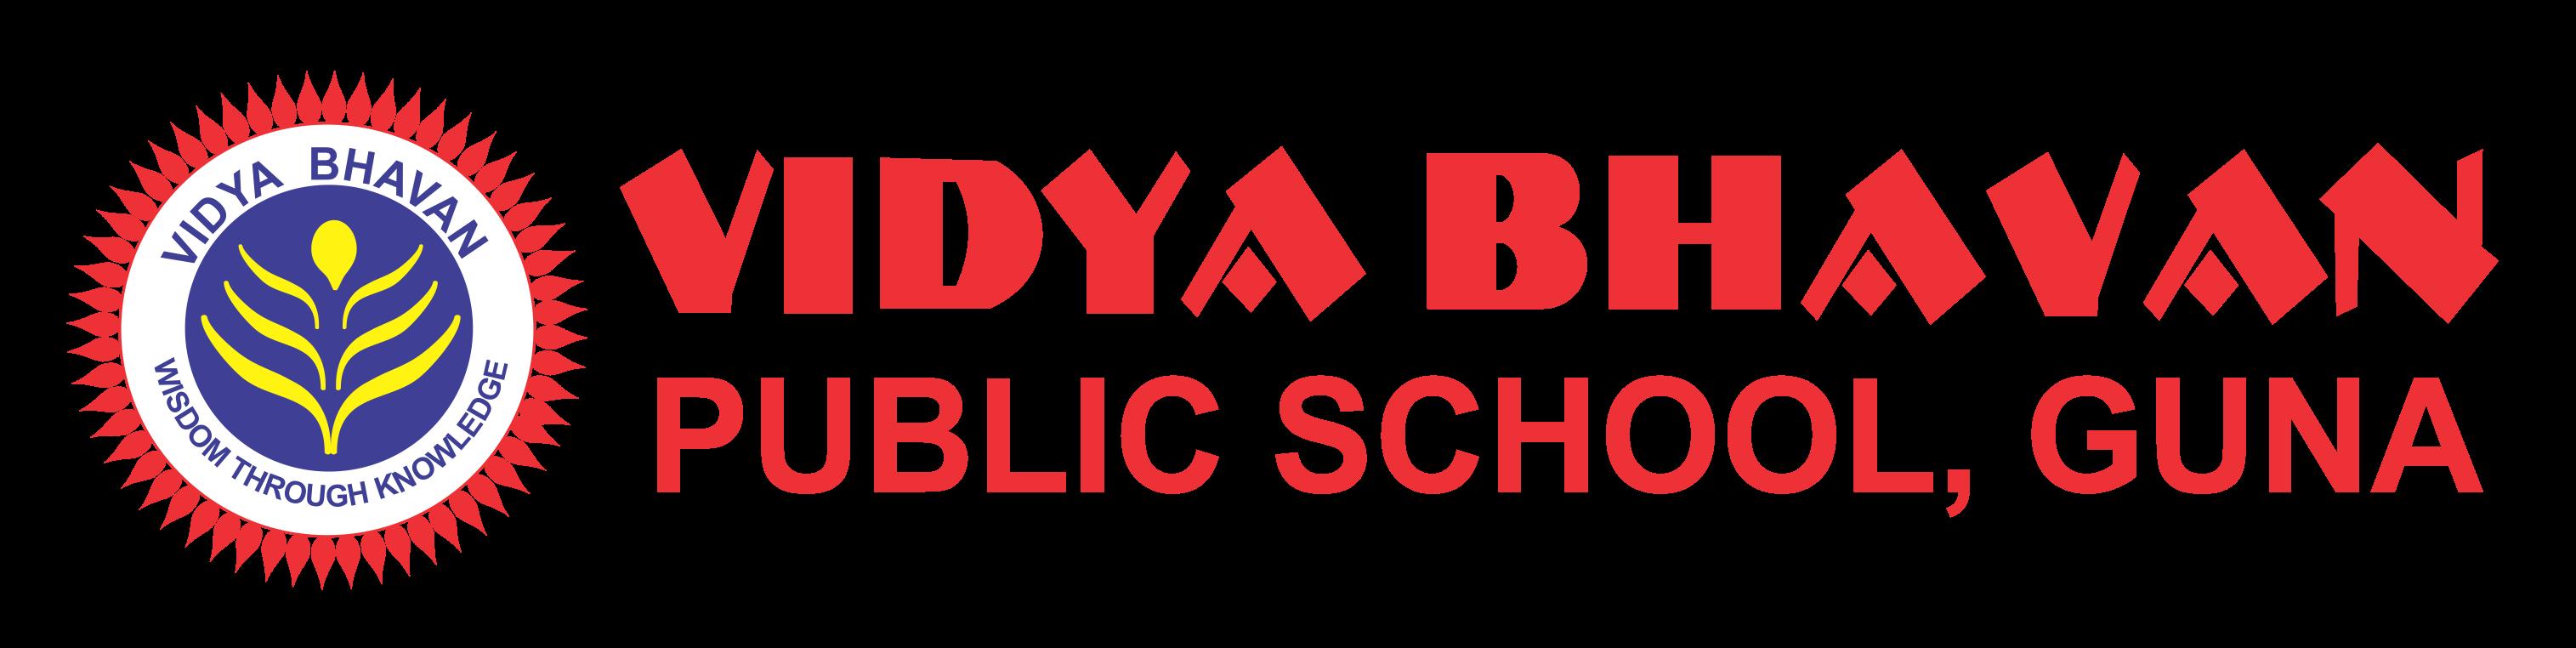 Vidyabhavan Public School